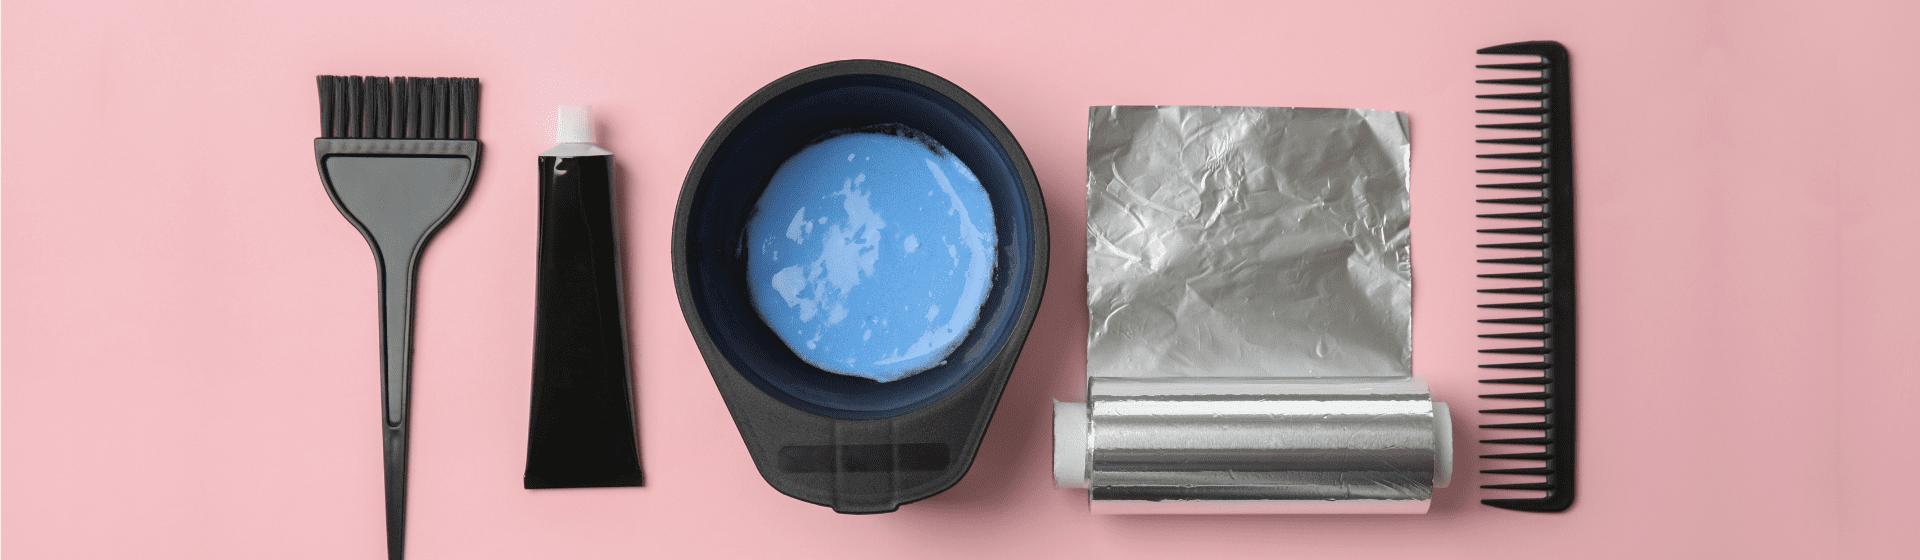 Tintura e tonalizante: qual a diferença entre tintura e tonalizante?